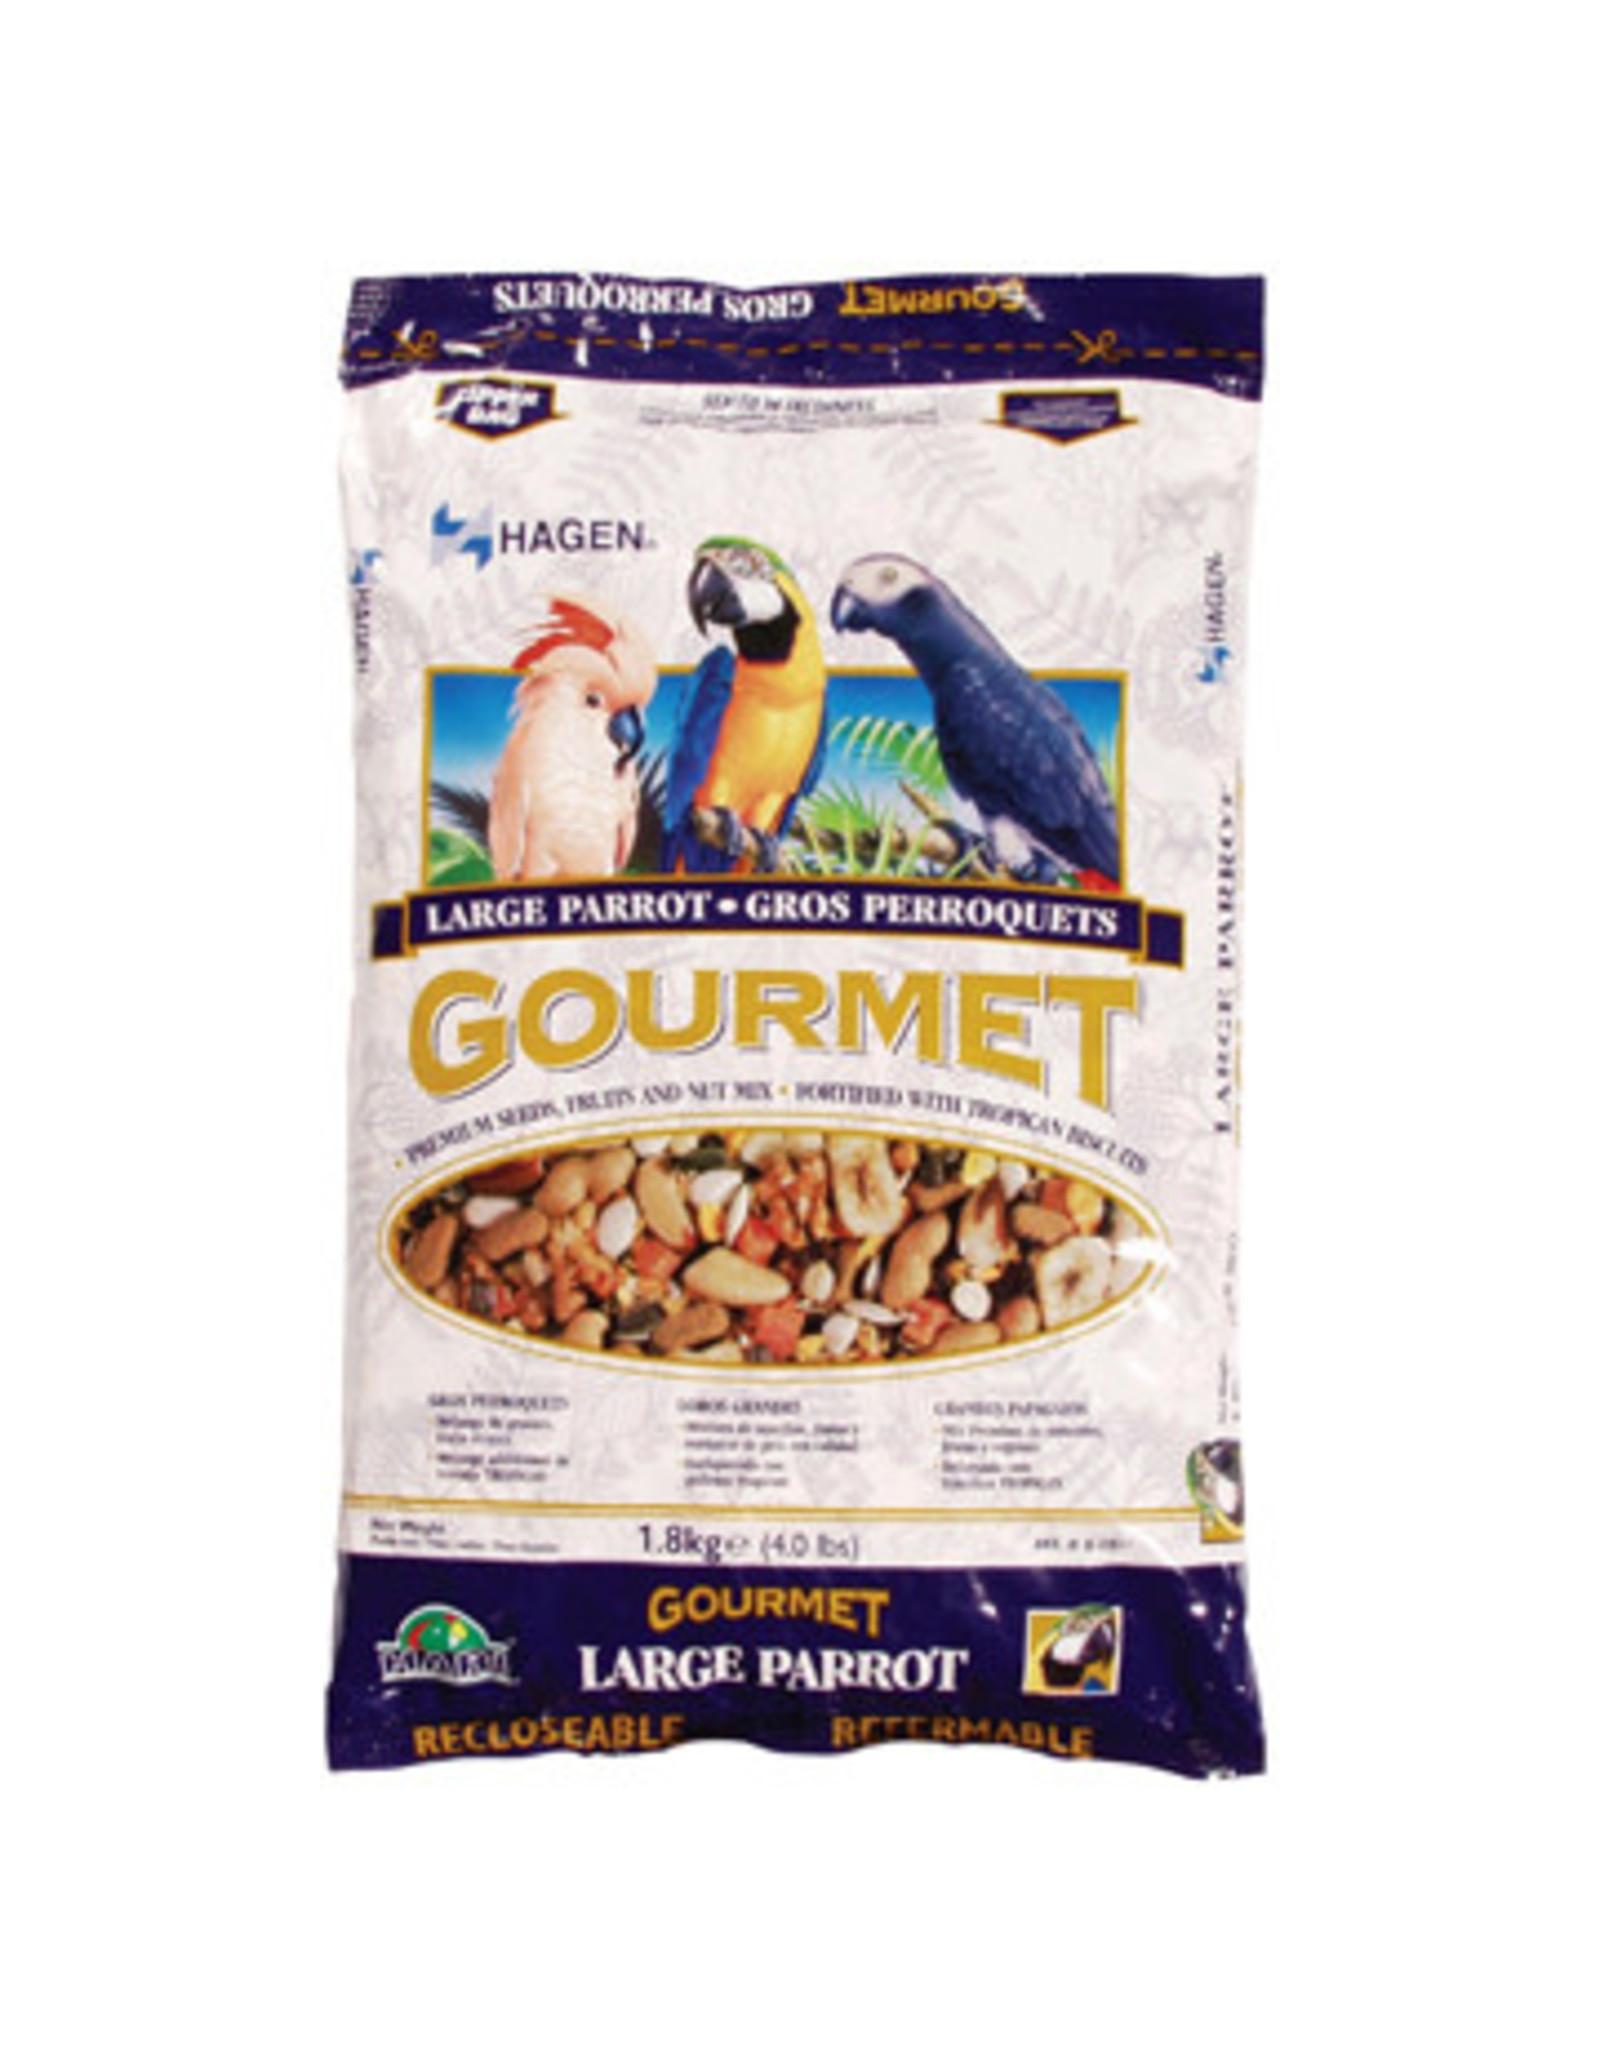 HG - Hagen Parrot Gourmet Seed Mix 1.8kg-V